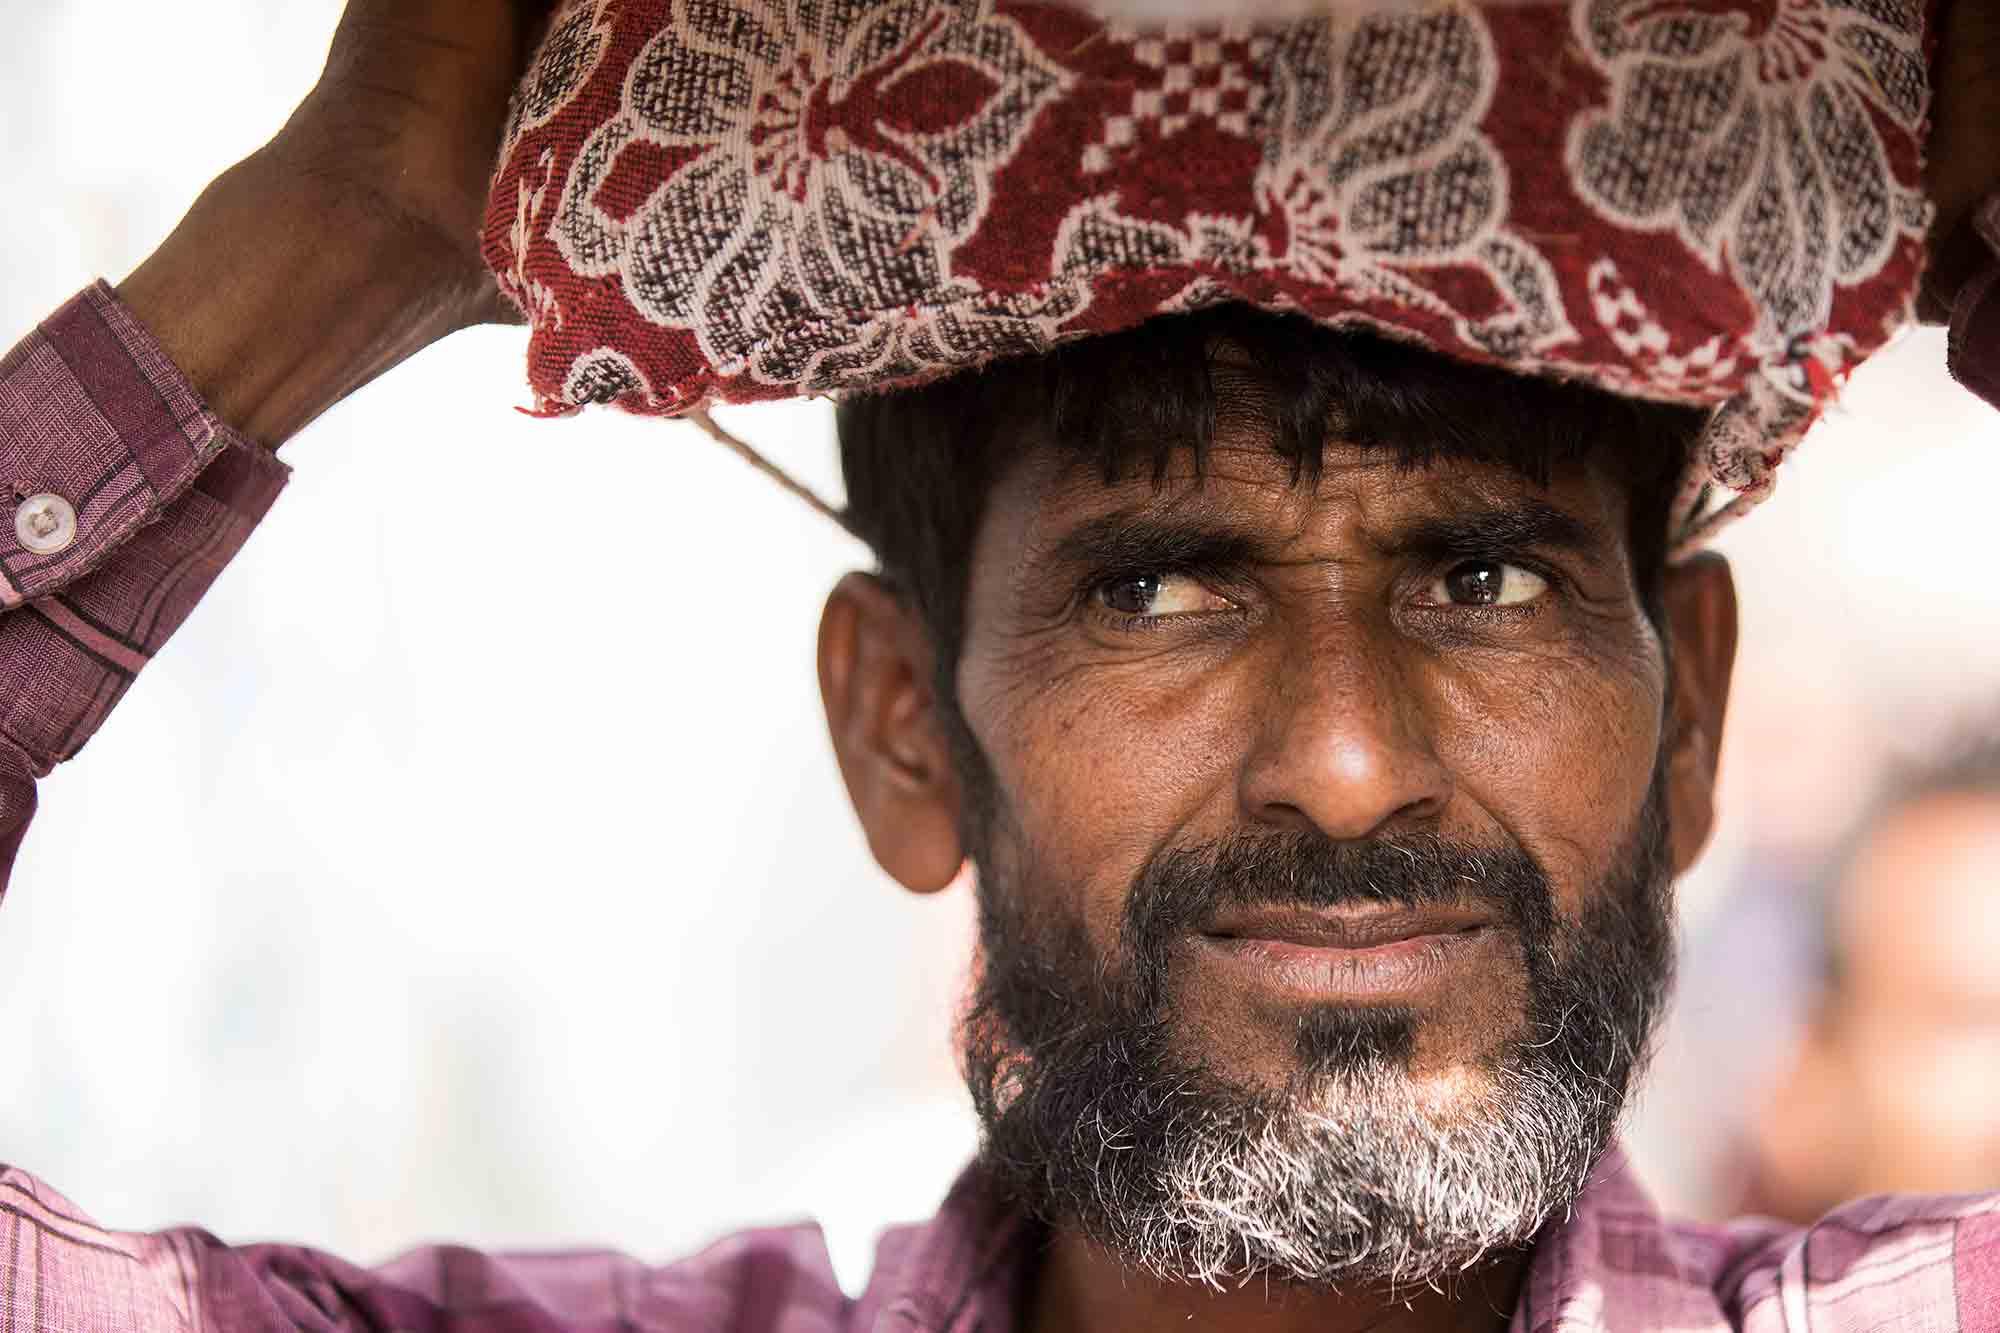 Koley-Market-kolkata-portrait-india